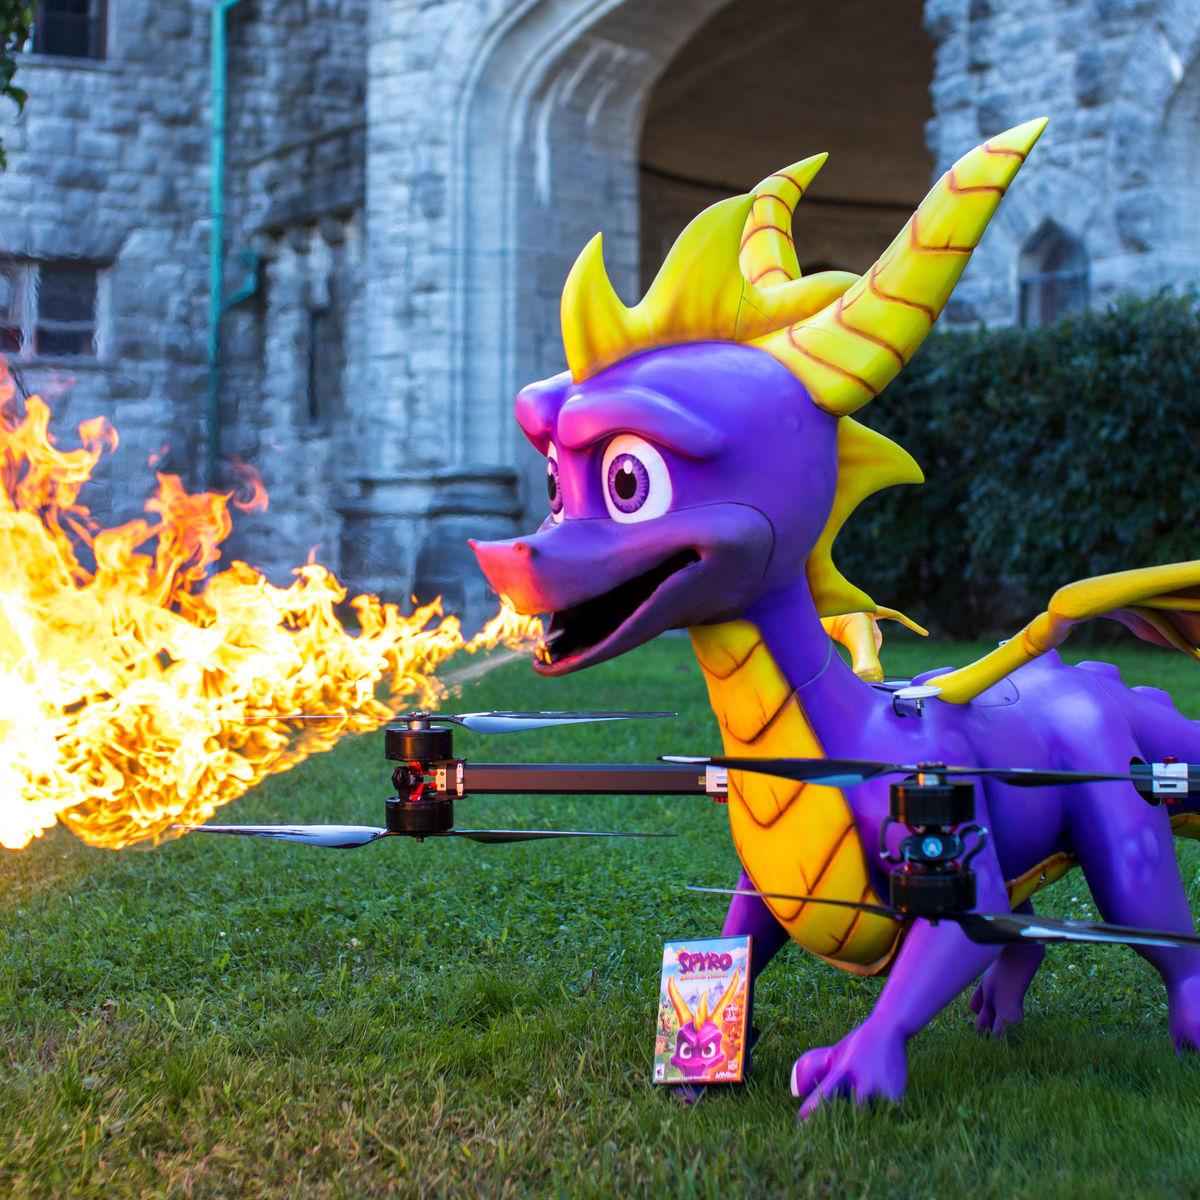 Spyro drone